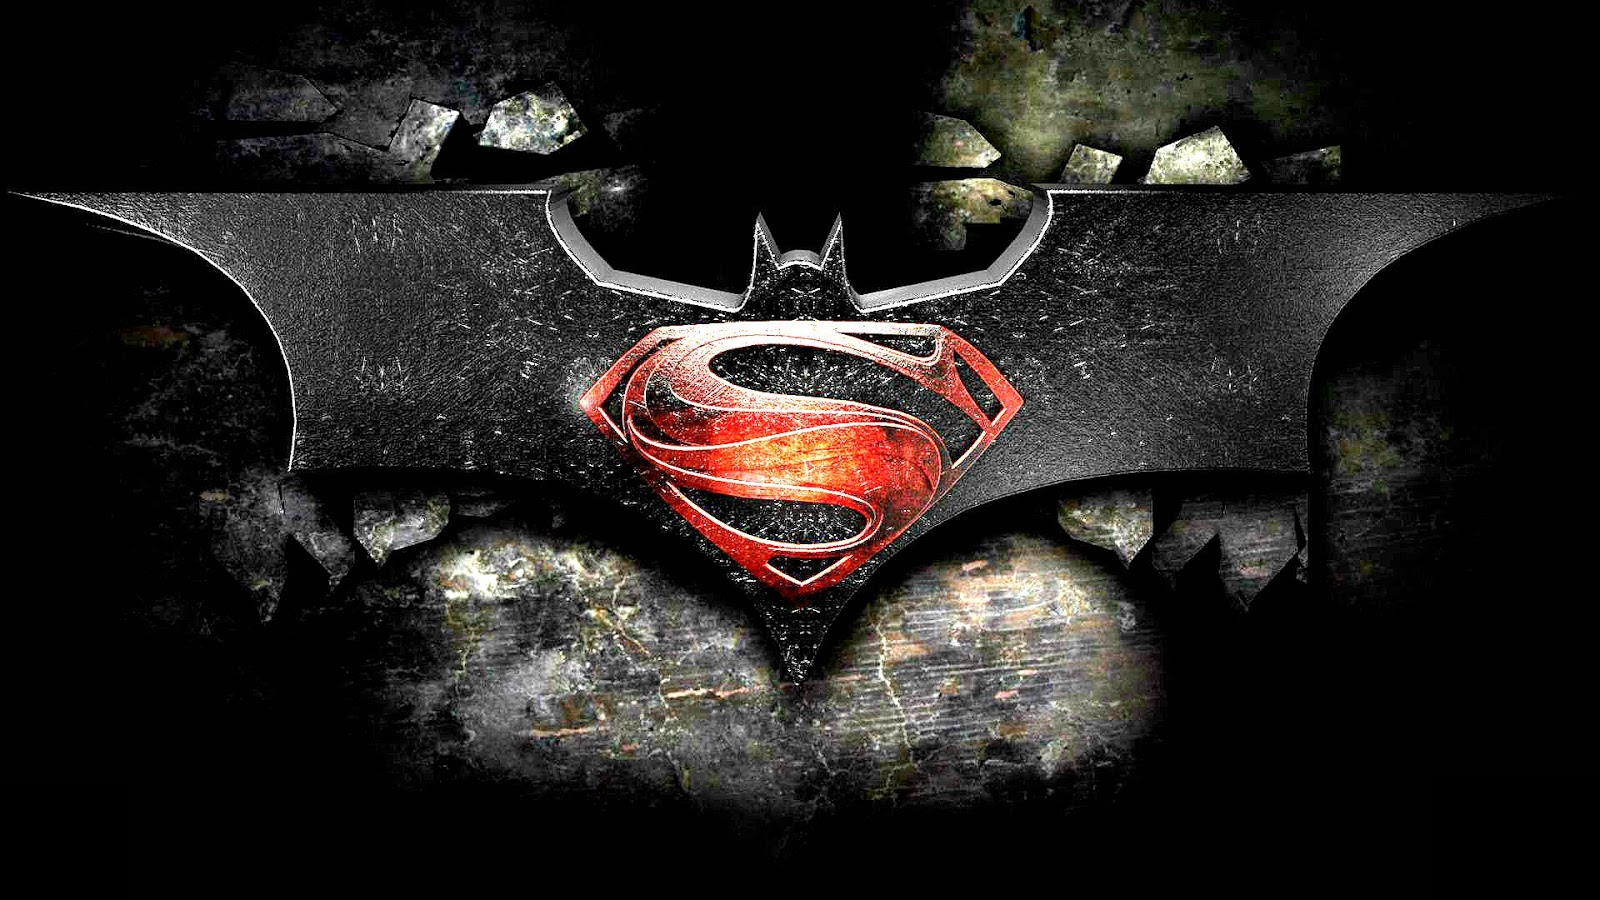 27 2015 By Stephen Comments Off on Batman Vs Superman HD Wallpaper 1600x900